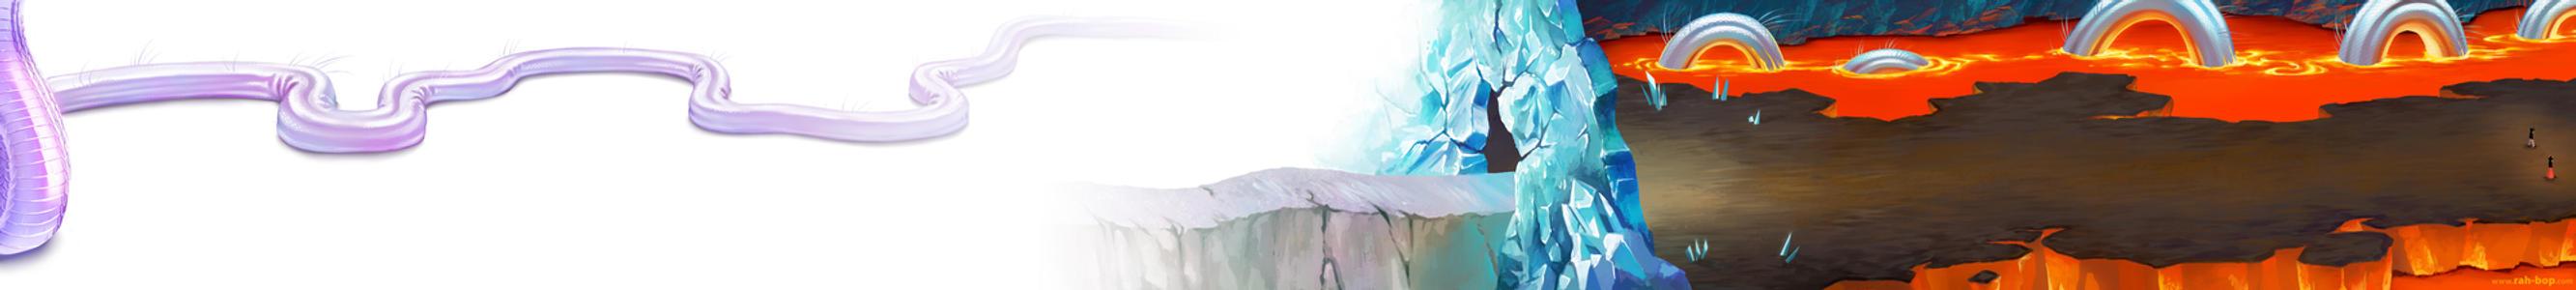 Echidna by rah-bop